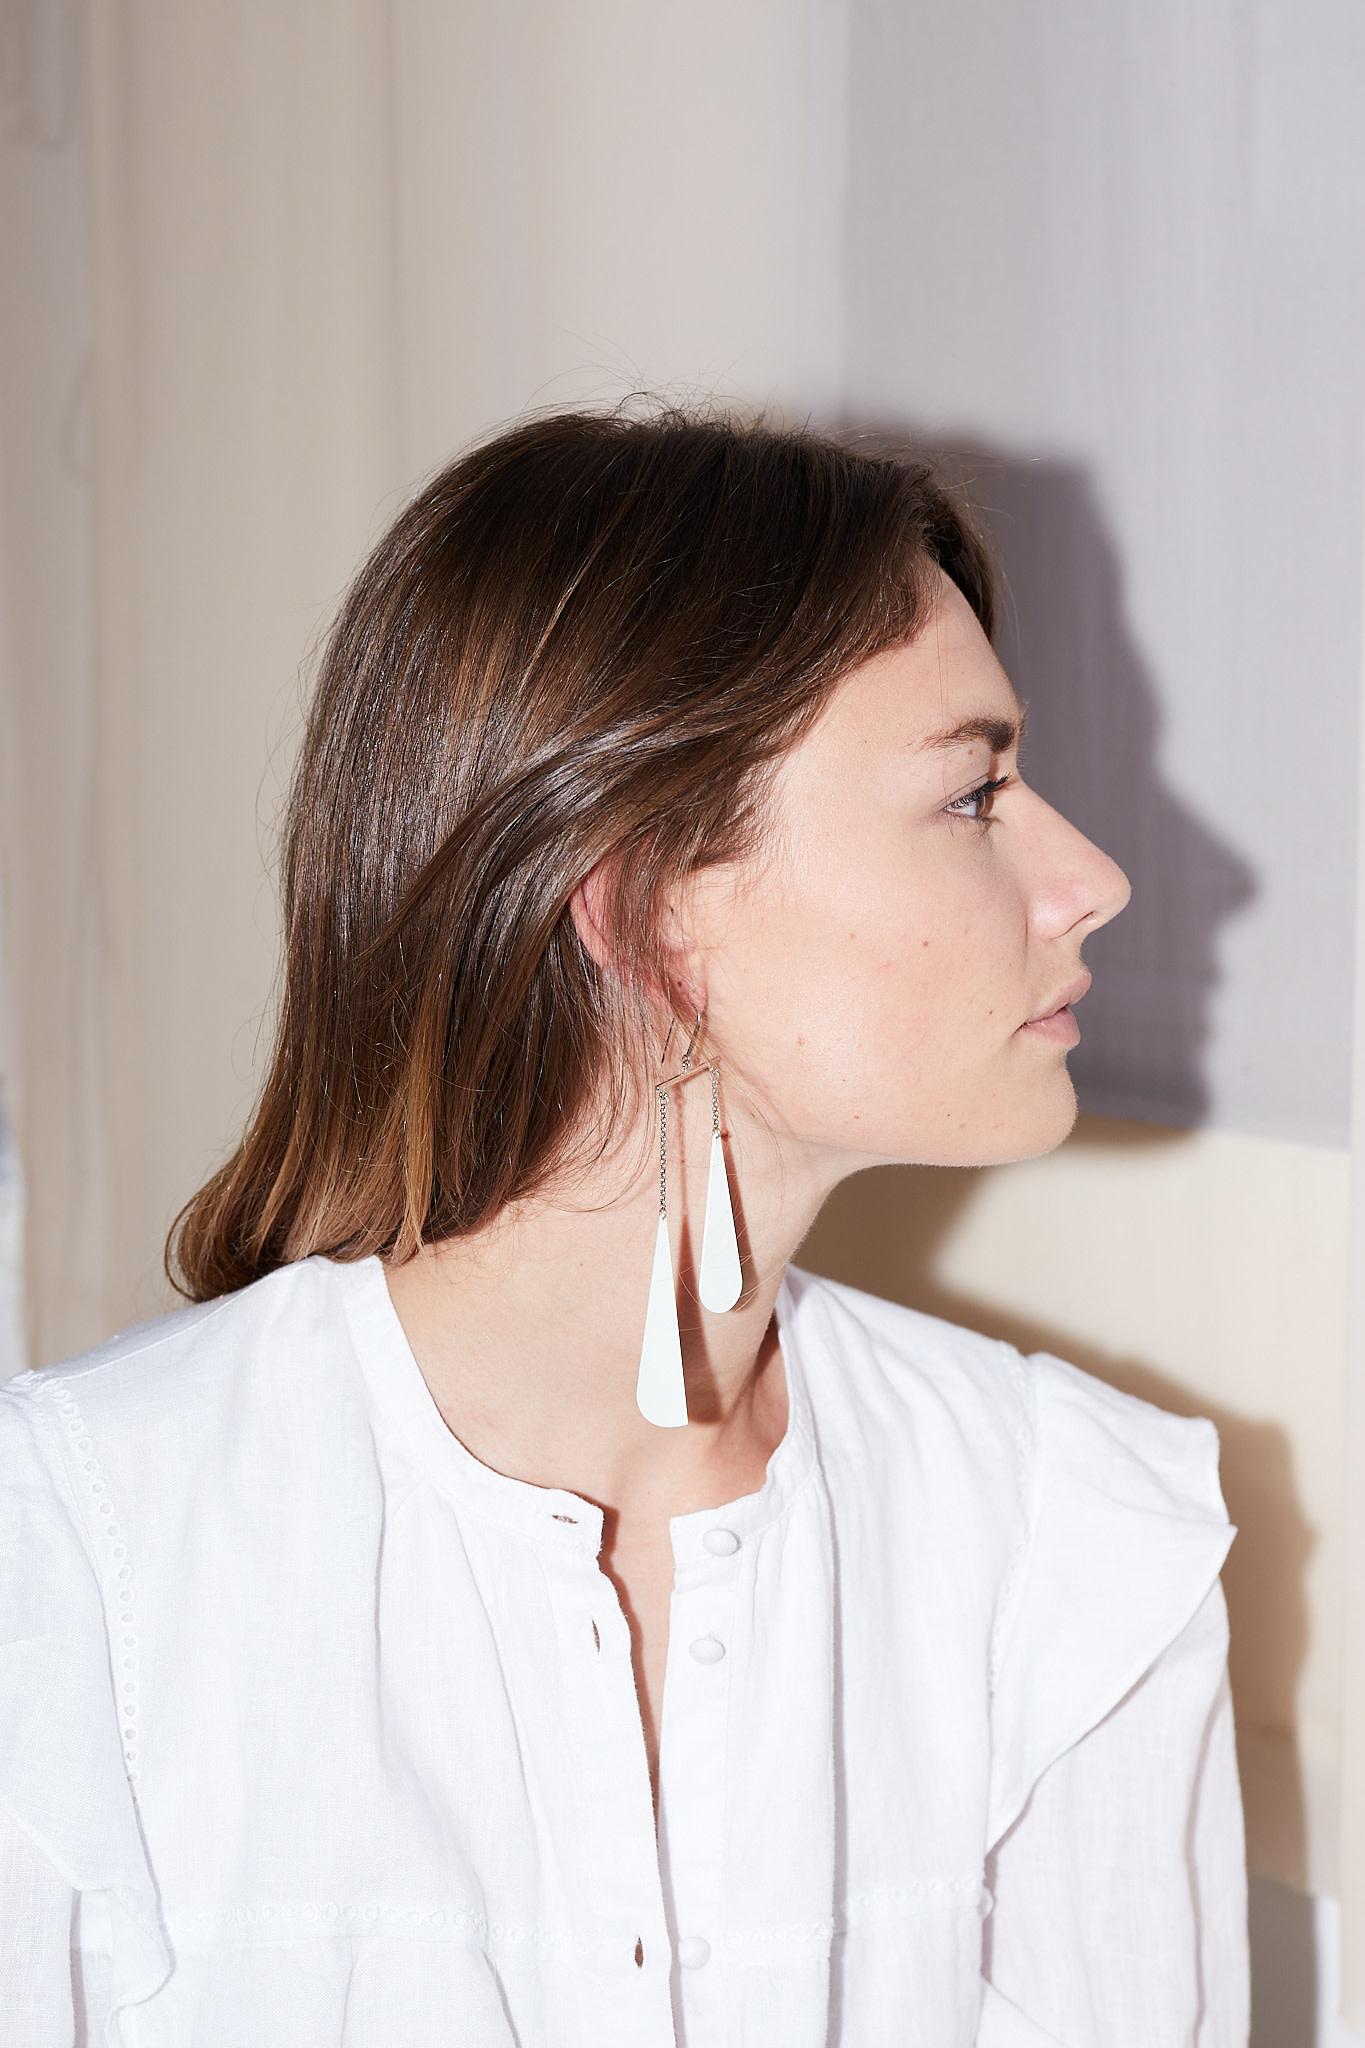 Isabel Marant - Boucle d'Oreill color drop earrings